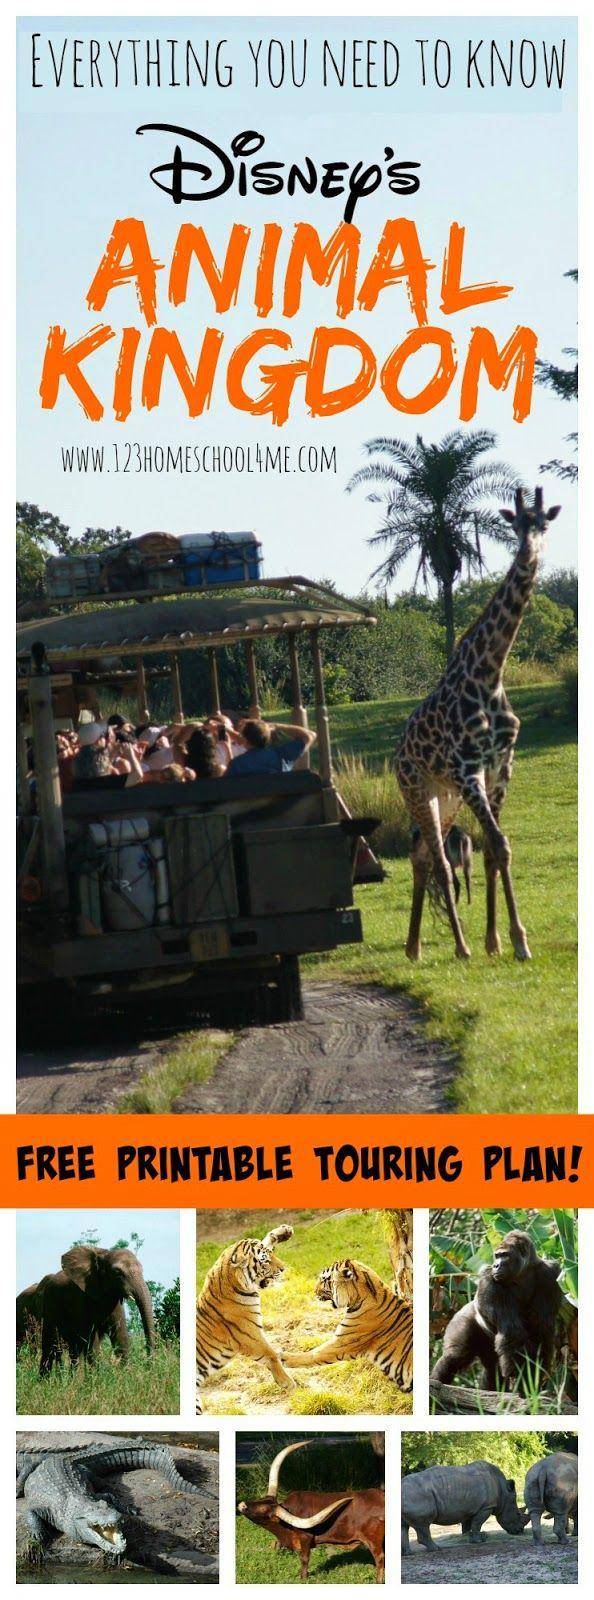 Must Read Animal Kingdom Planning Tips | 123 Homeschool 4 Me #animalkingdom